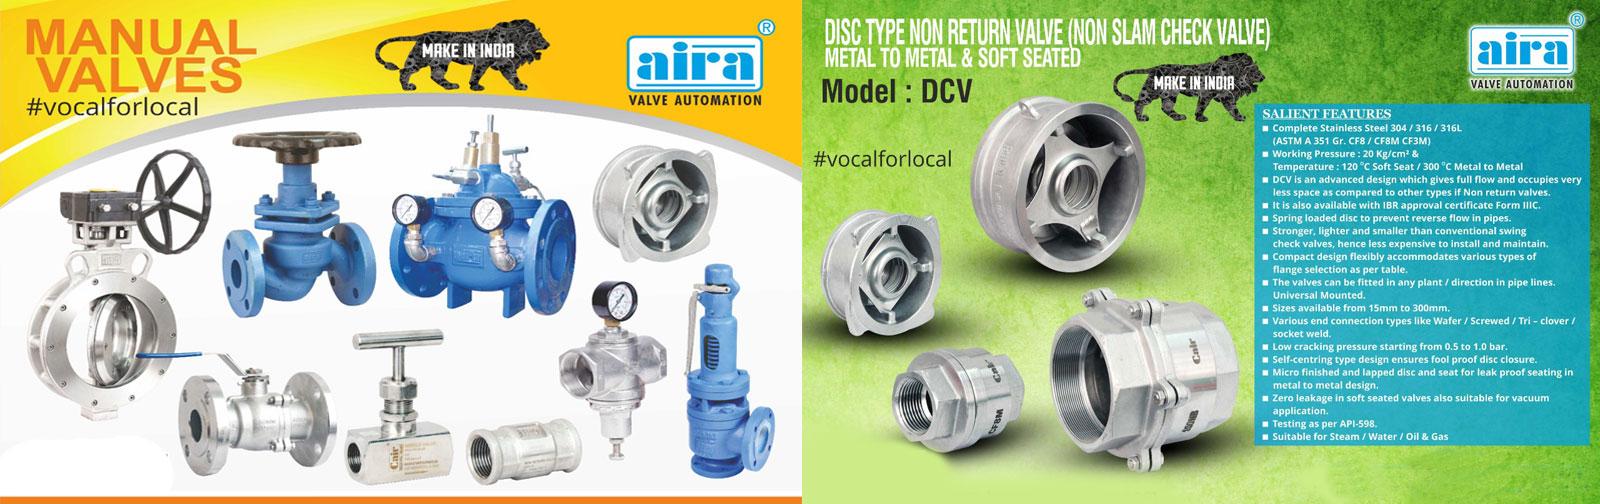 Pneumatic Actuators In Kolkata Manufacturer Air Flow Control Valve Schematic Rotary